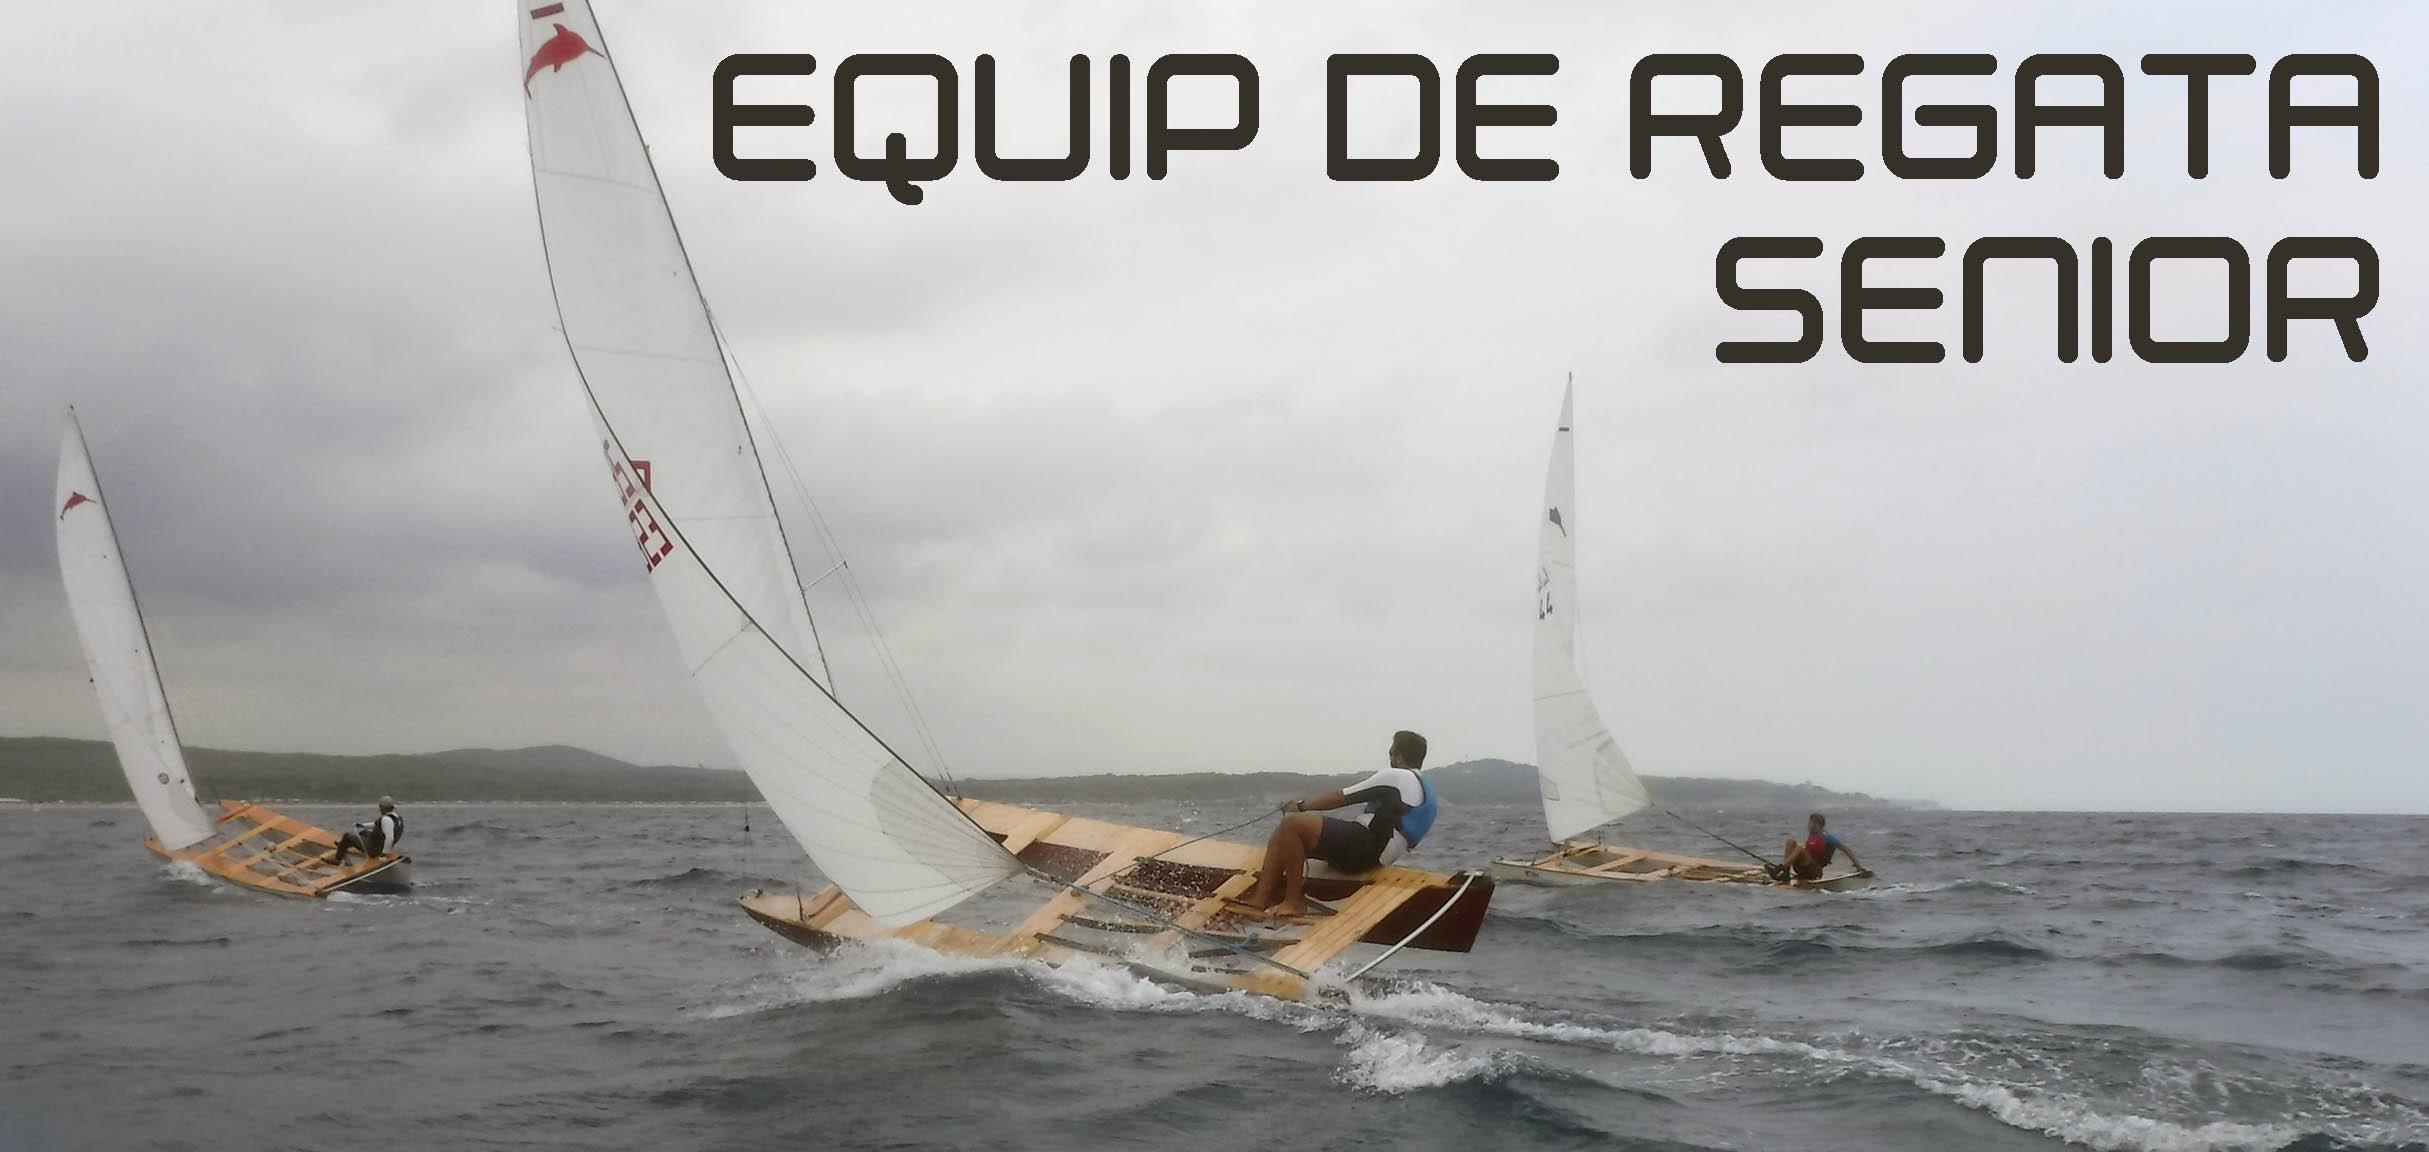 EQUIP DE REGATA SENIOR